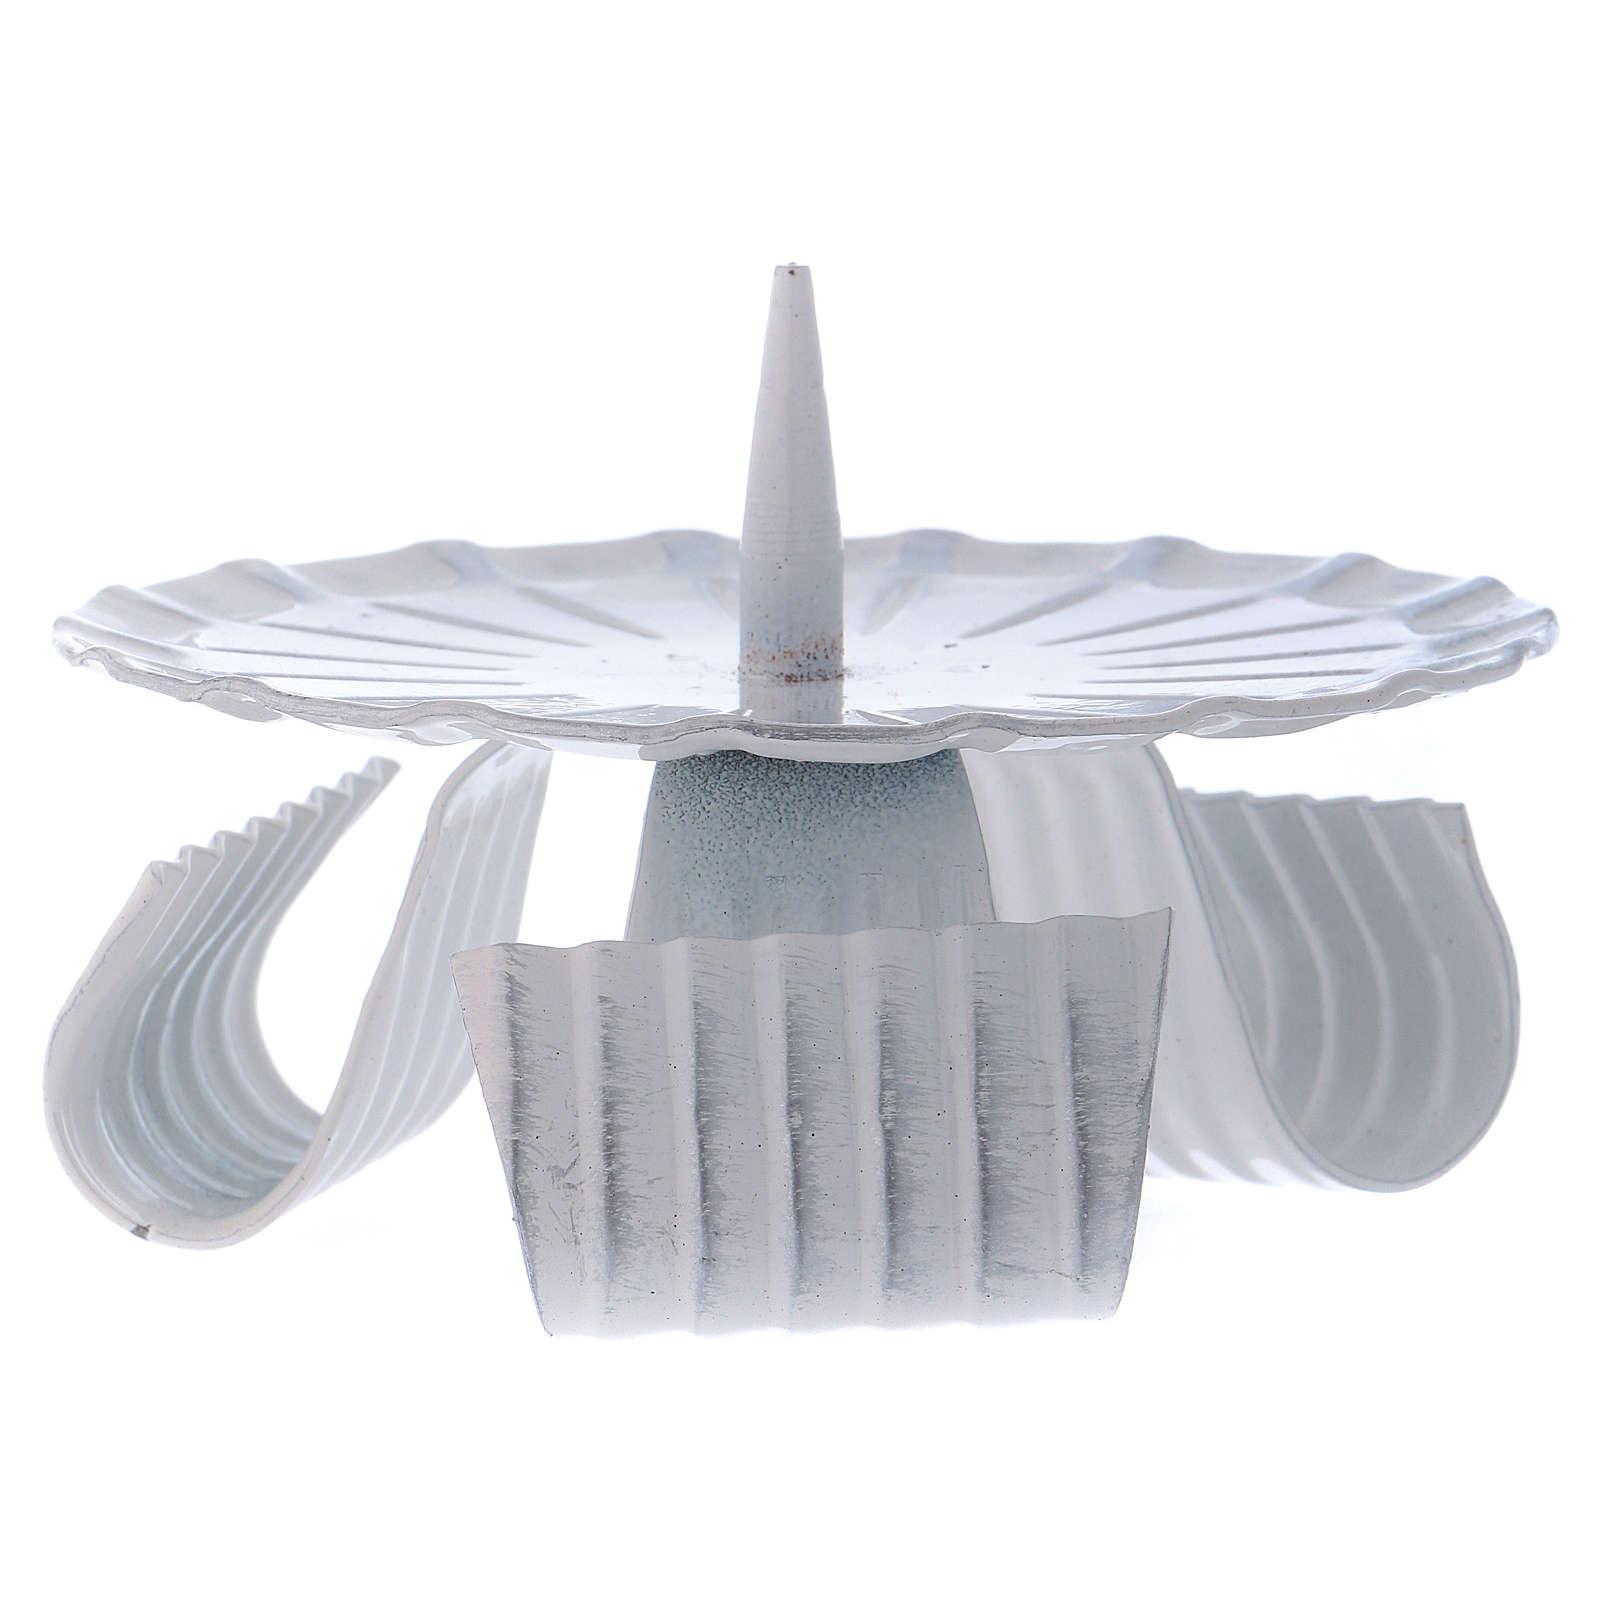 Portacandele tre piedi con spuntone in ferro bianco d. 10 cm 3